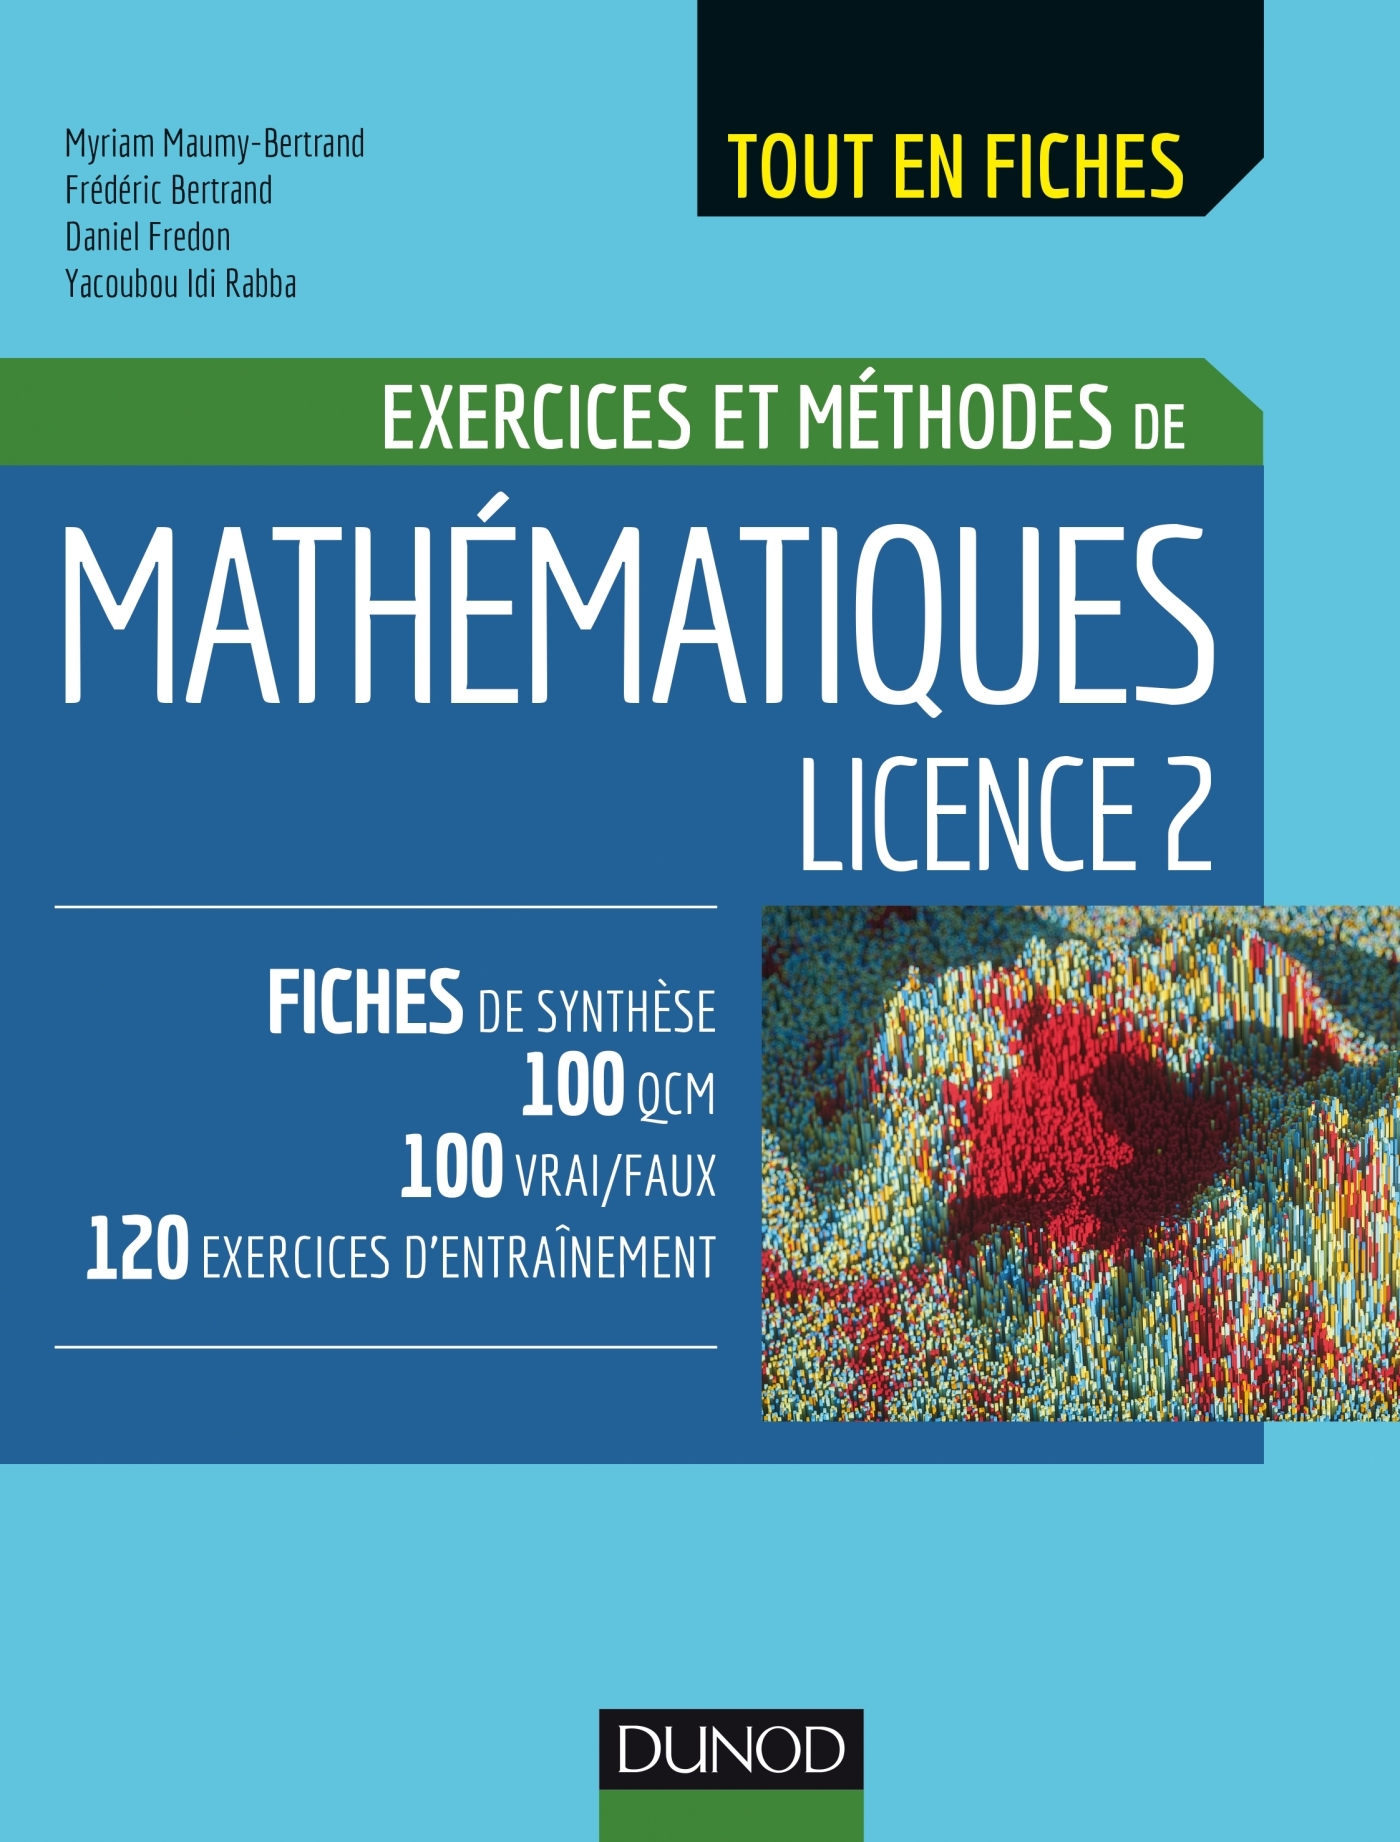 MATHEMATIQUES LICENCE 2 - EXERCICES ET METHODES